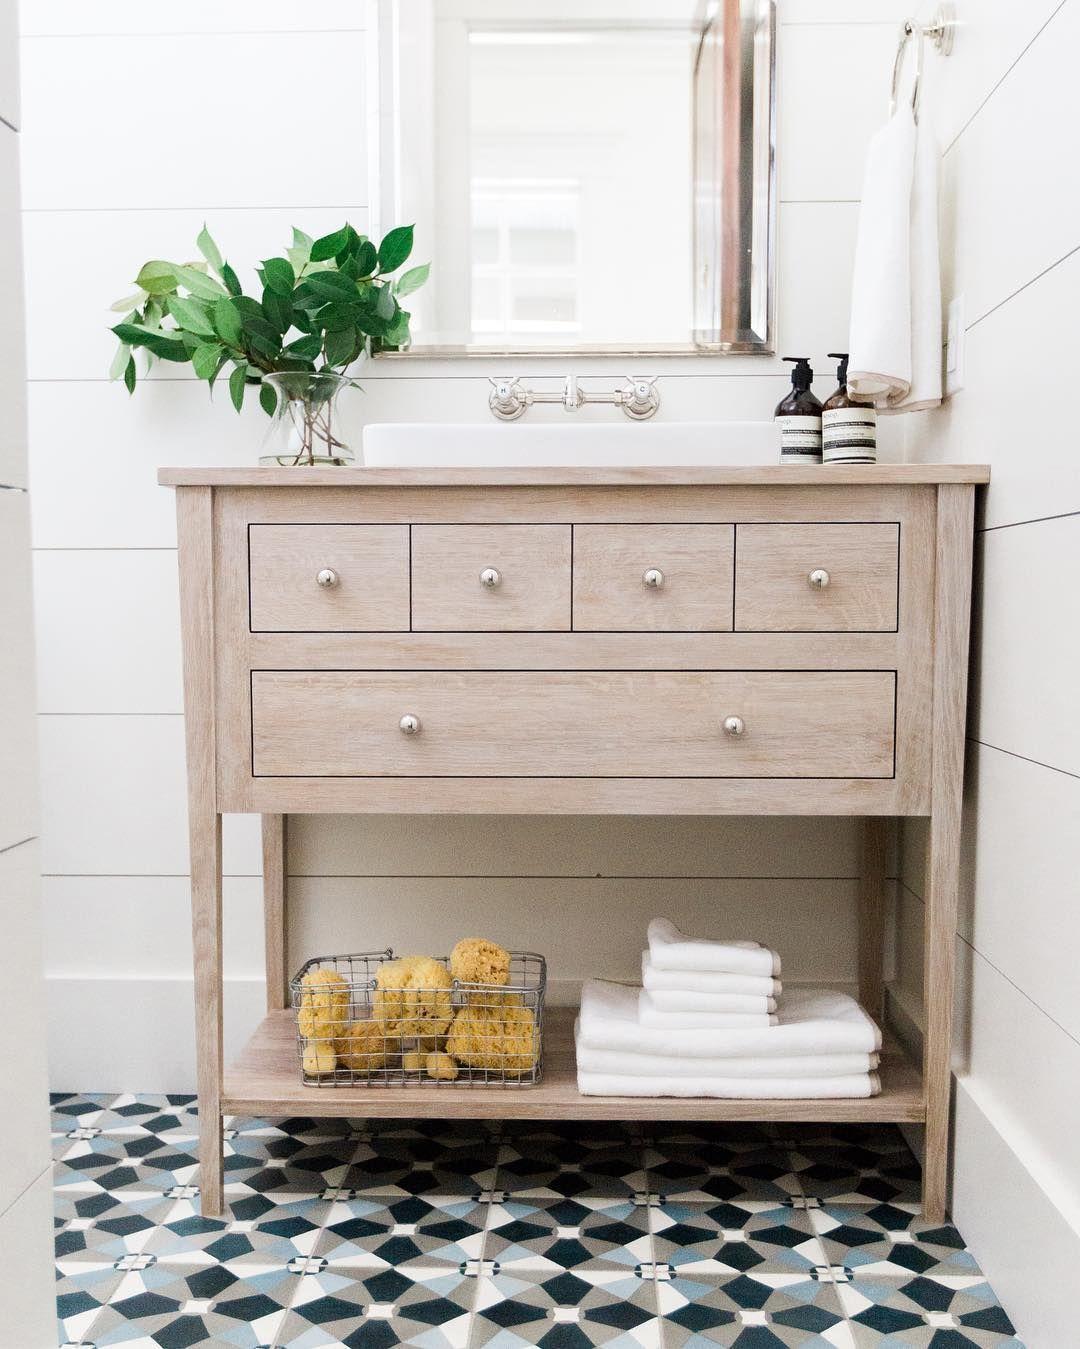 How To Tile A Bathroom Floor Video Patterned Tile Shiplap Wwwstudio Mcgeecom Bathrooms